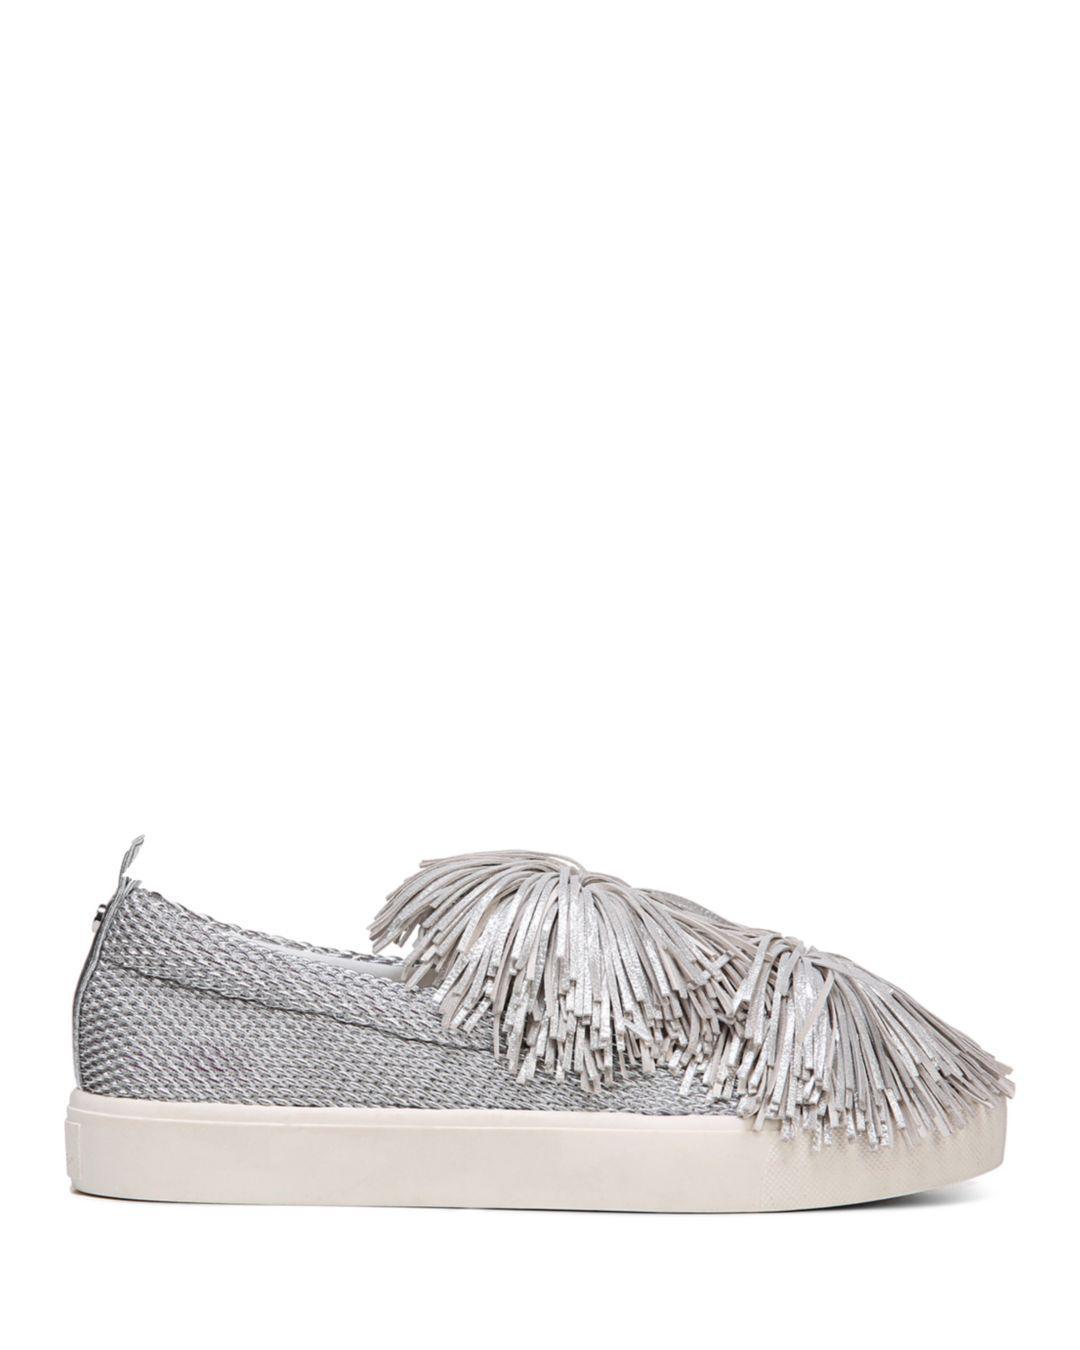 33a0e5768687 Sam Edelman Women s Emory Metallic Tassel Pom-pom Slip-on Sneakers ...